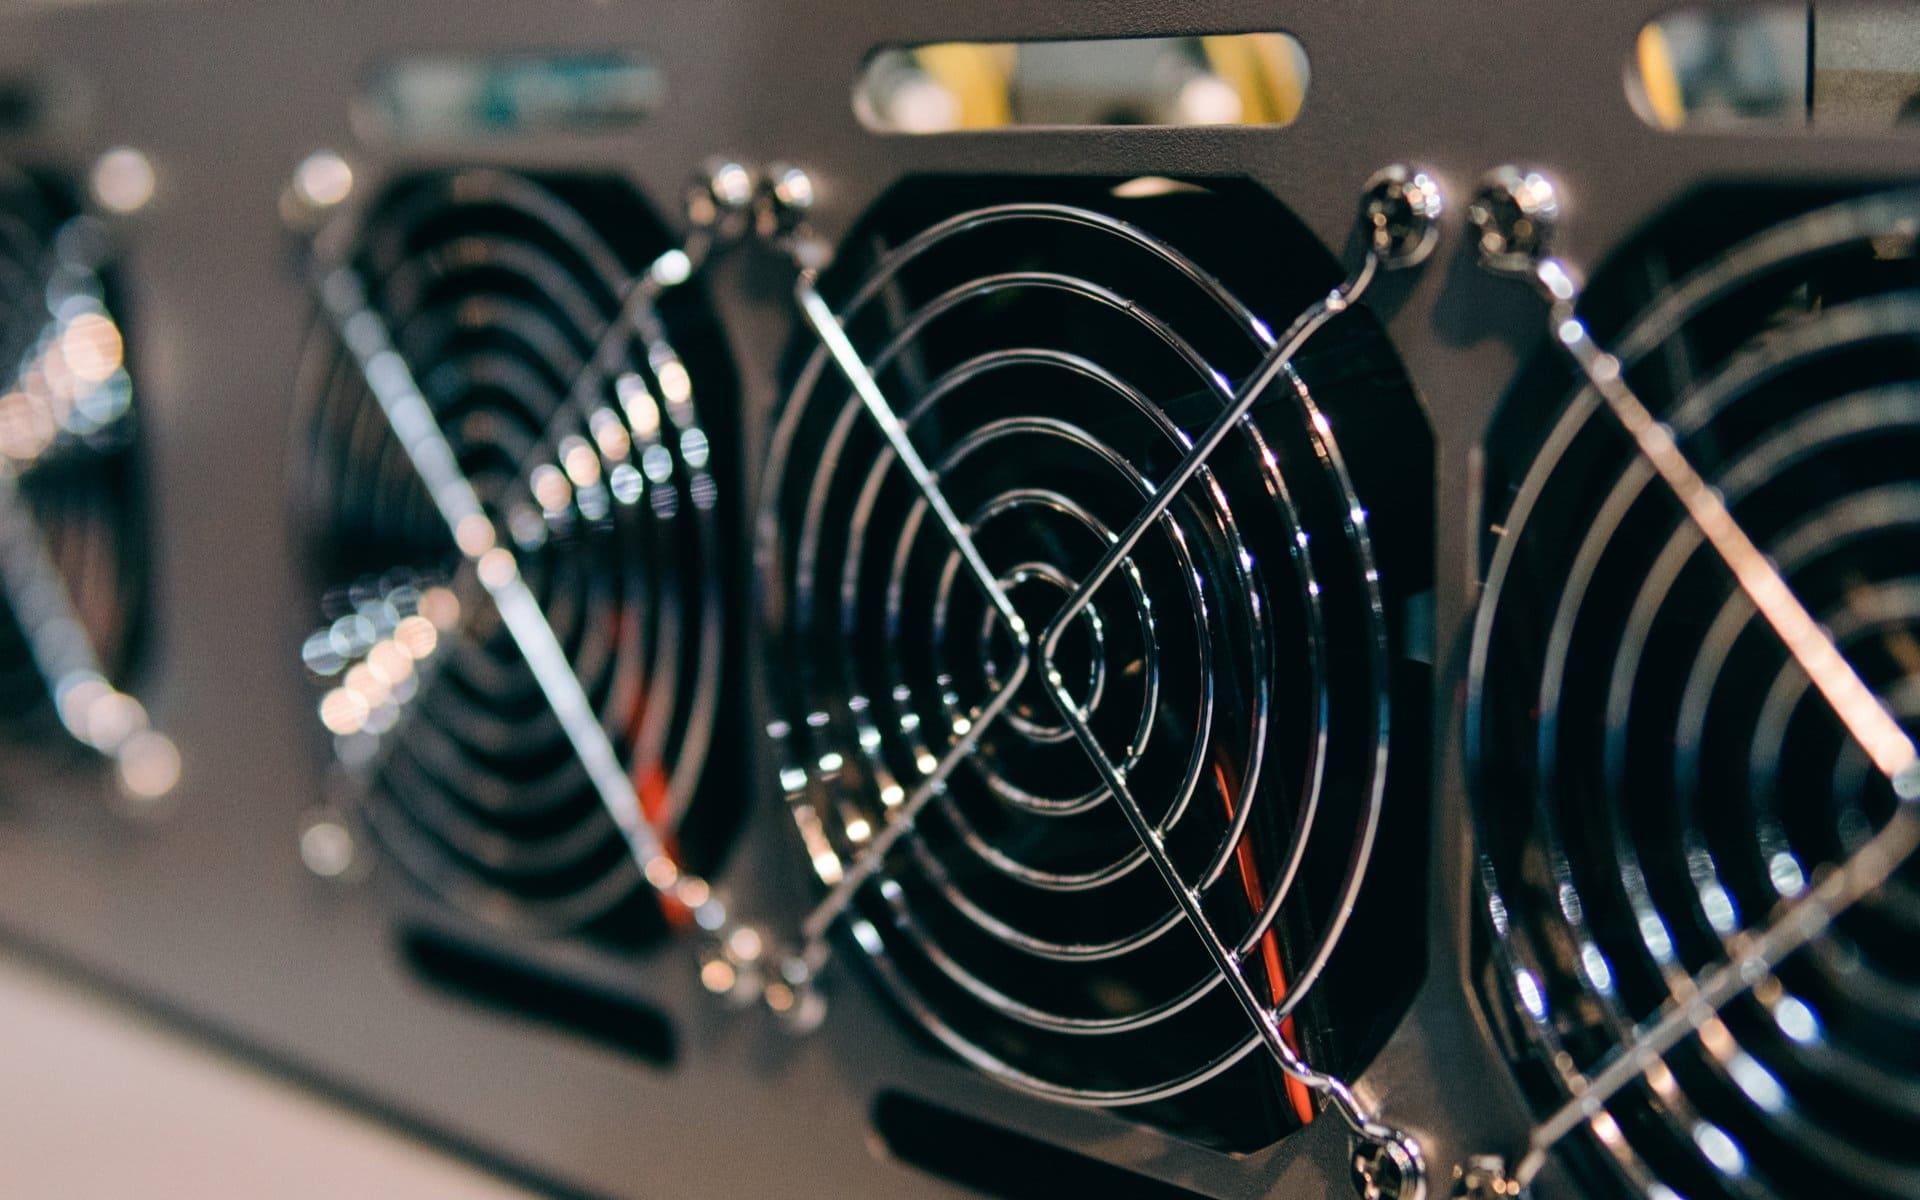 Halong Bitcoin mining